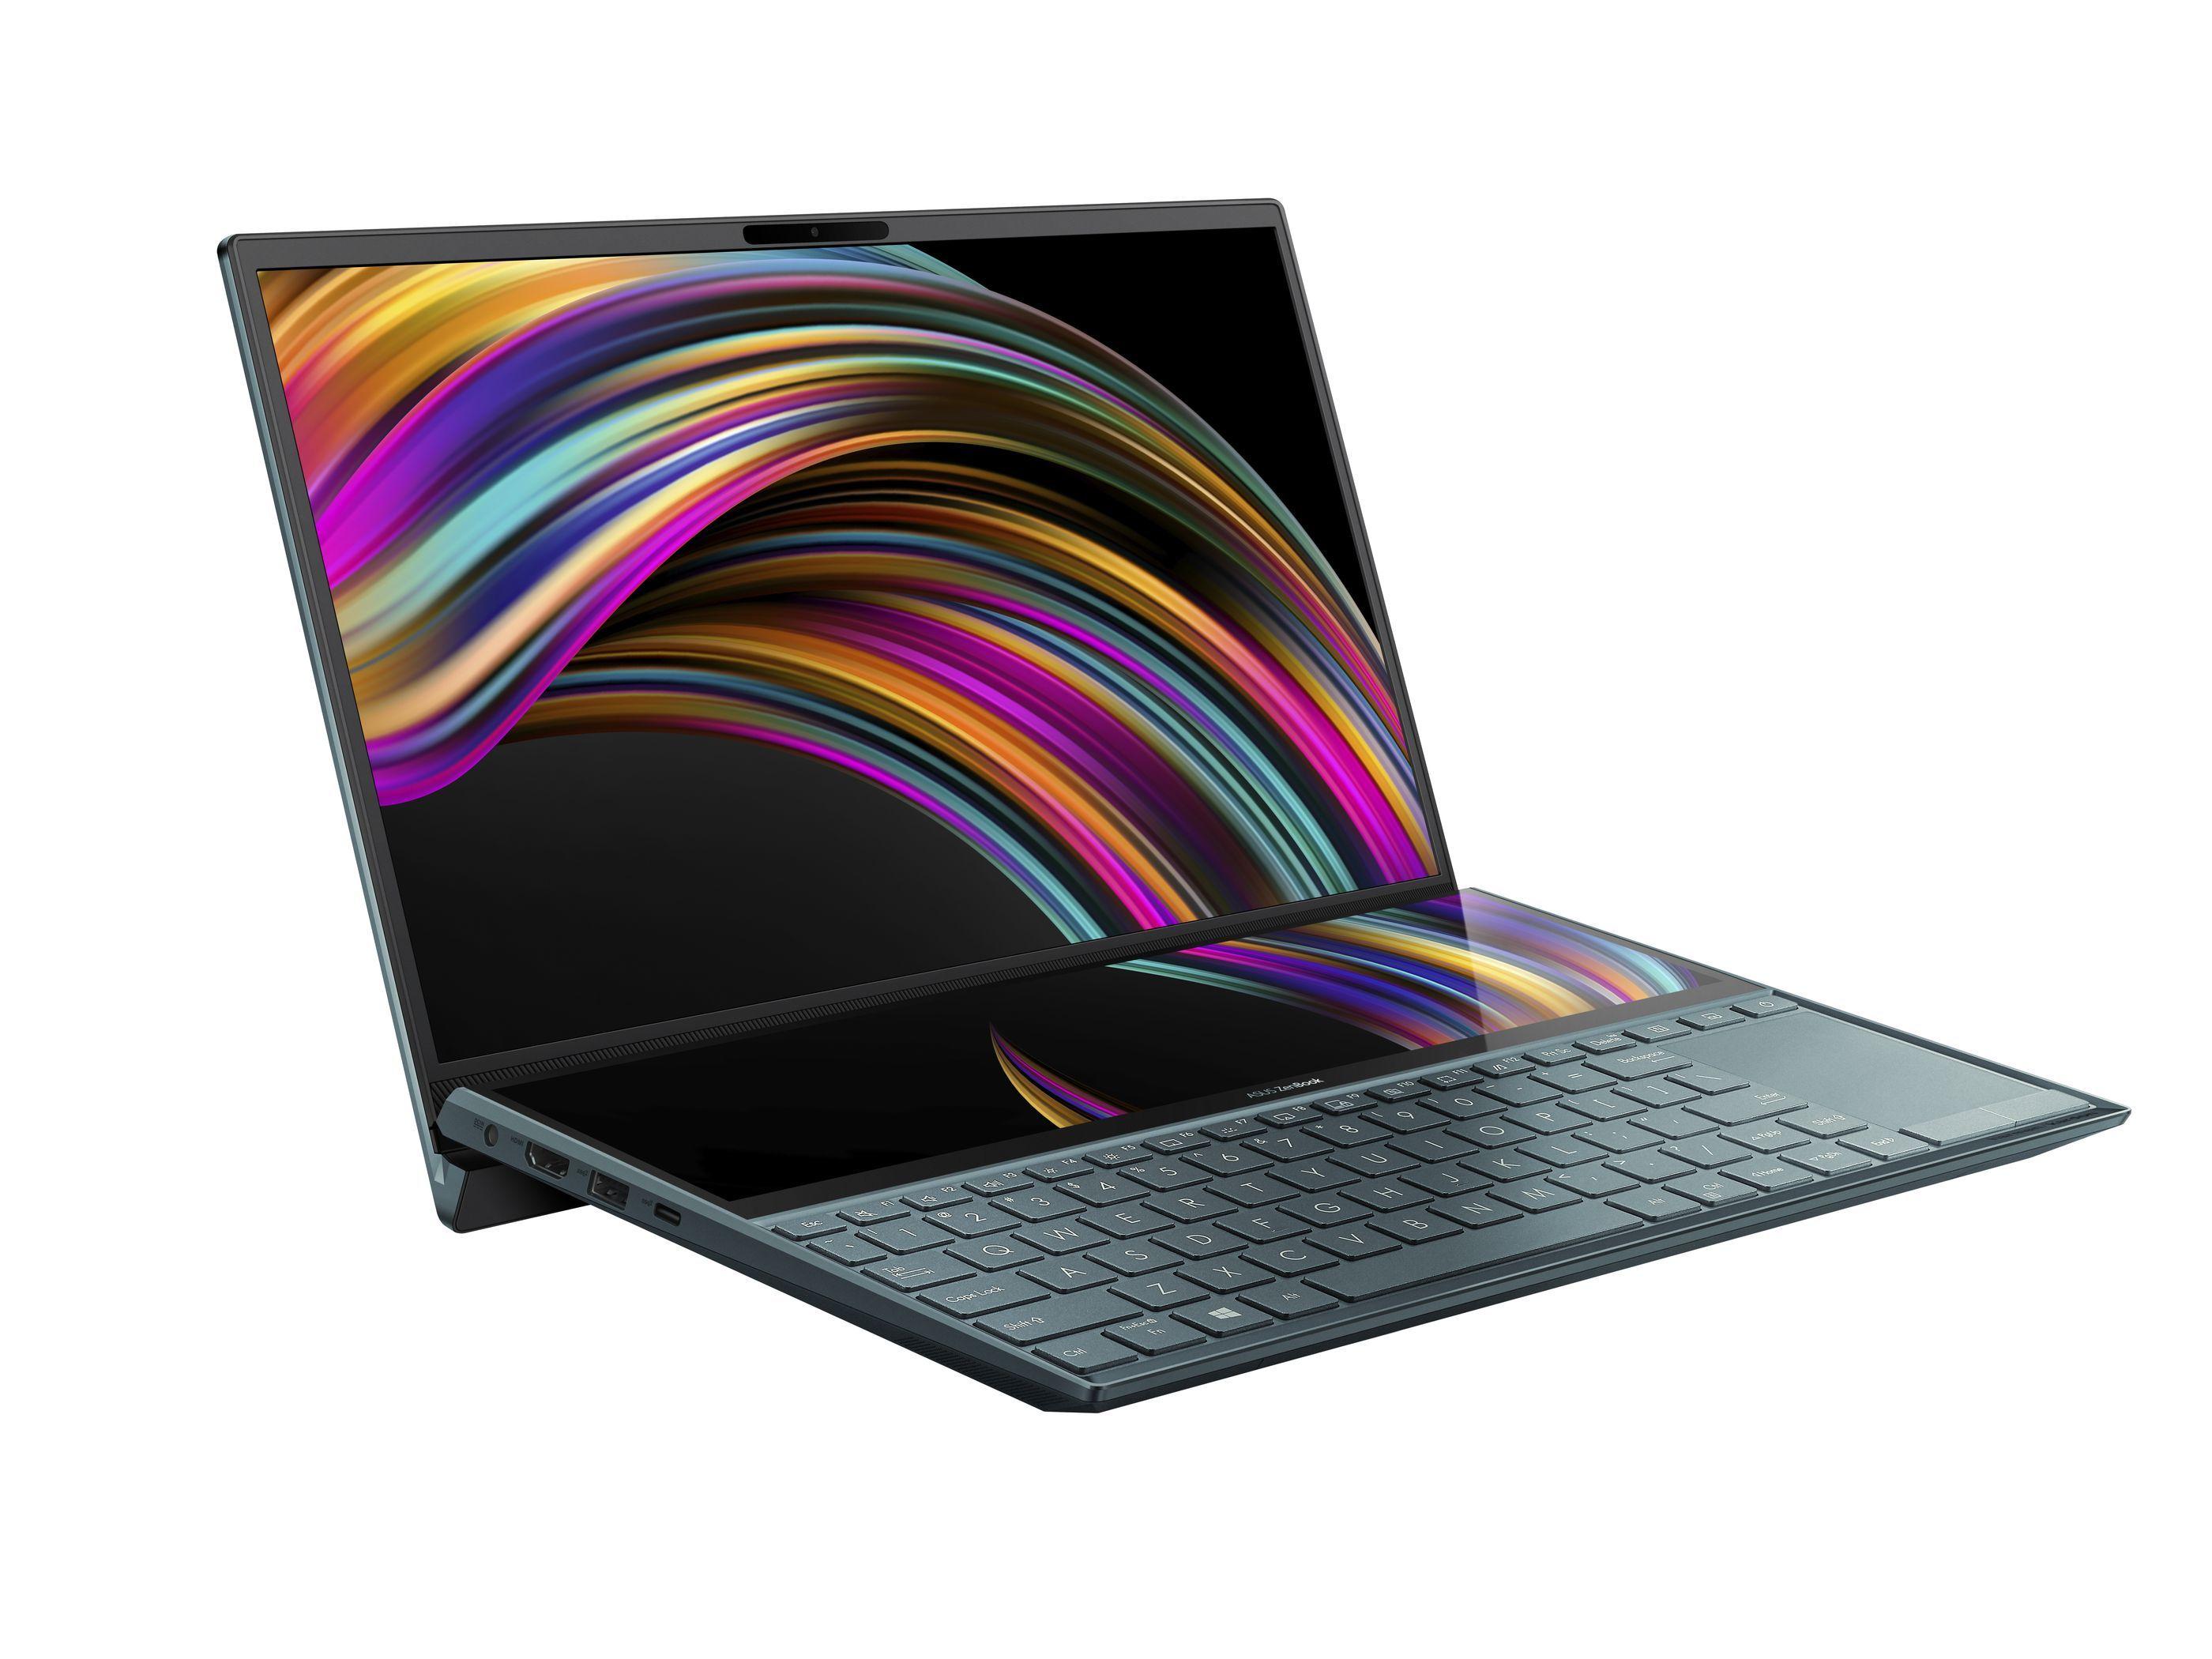 Zenbook Duo UX481FL-HJ144T